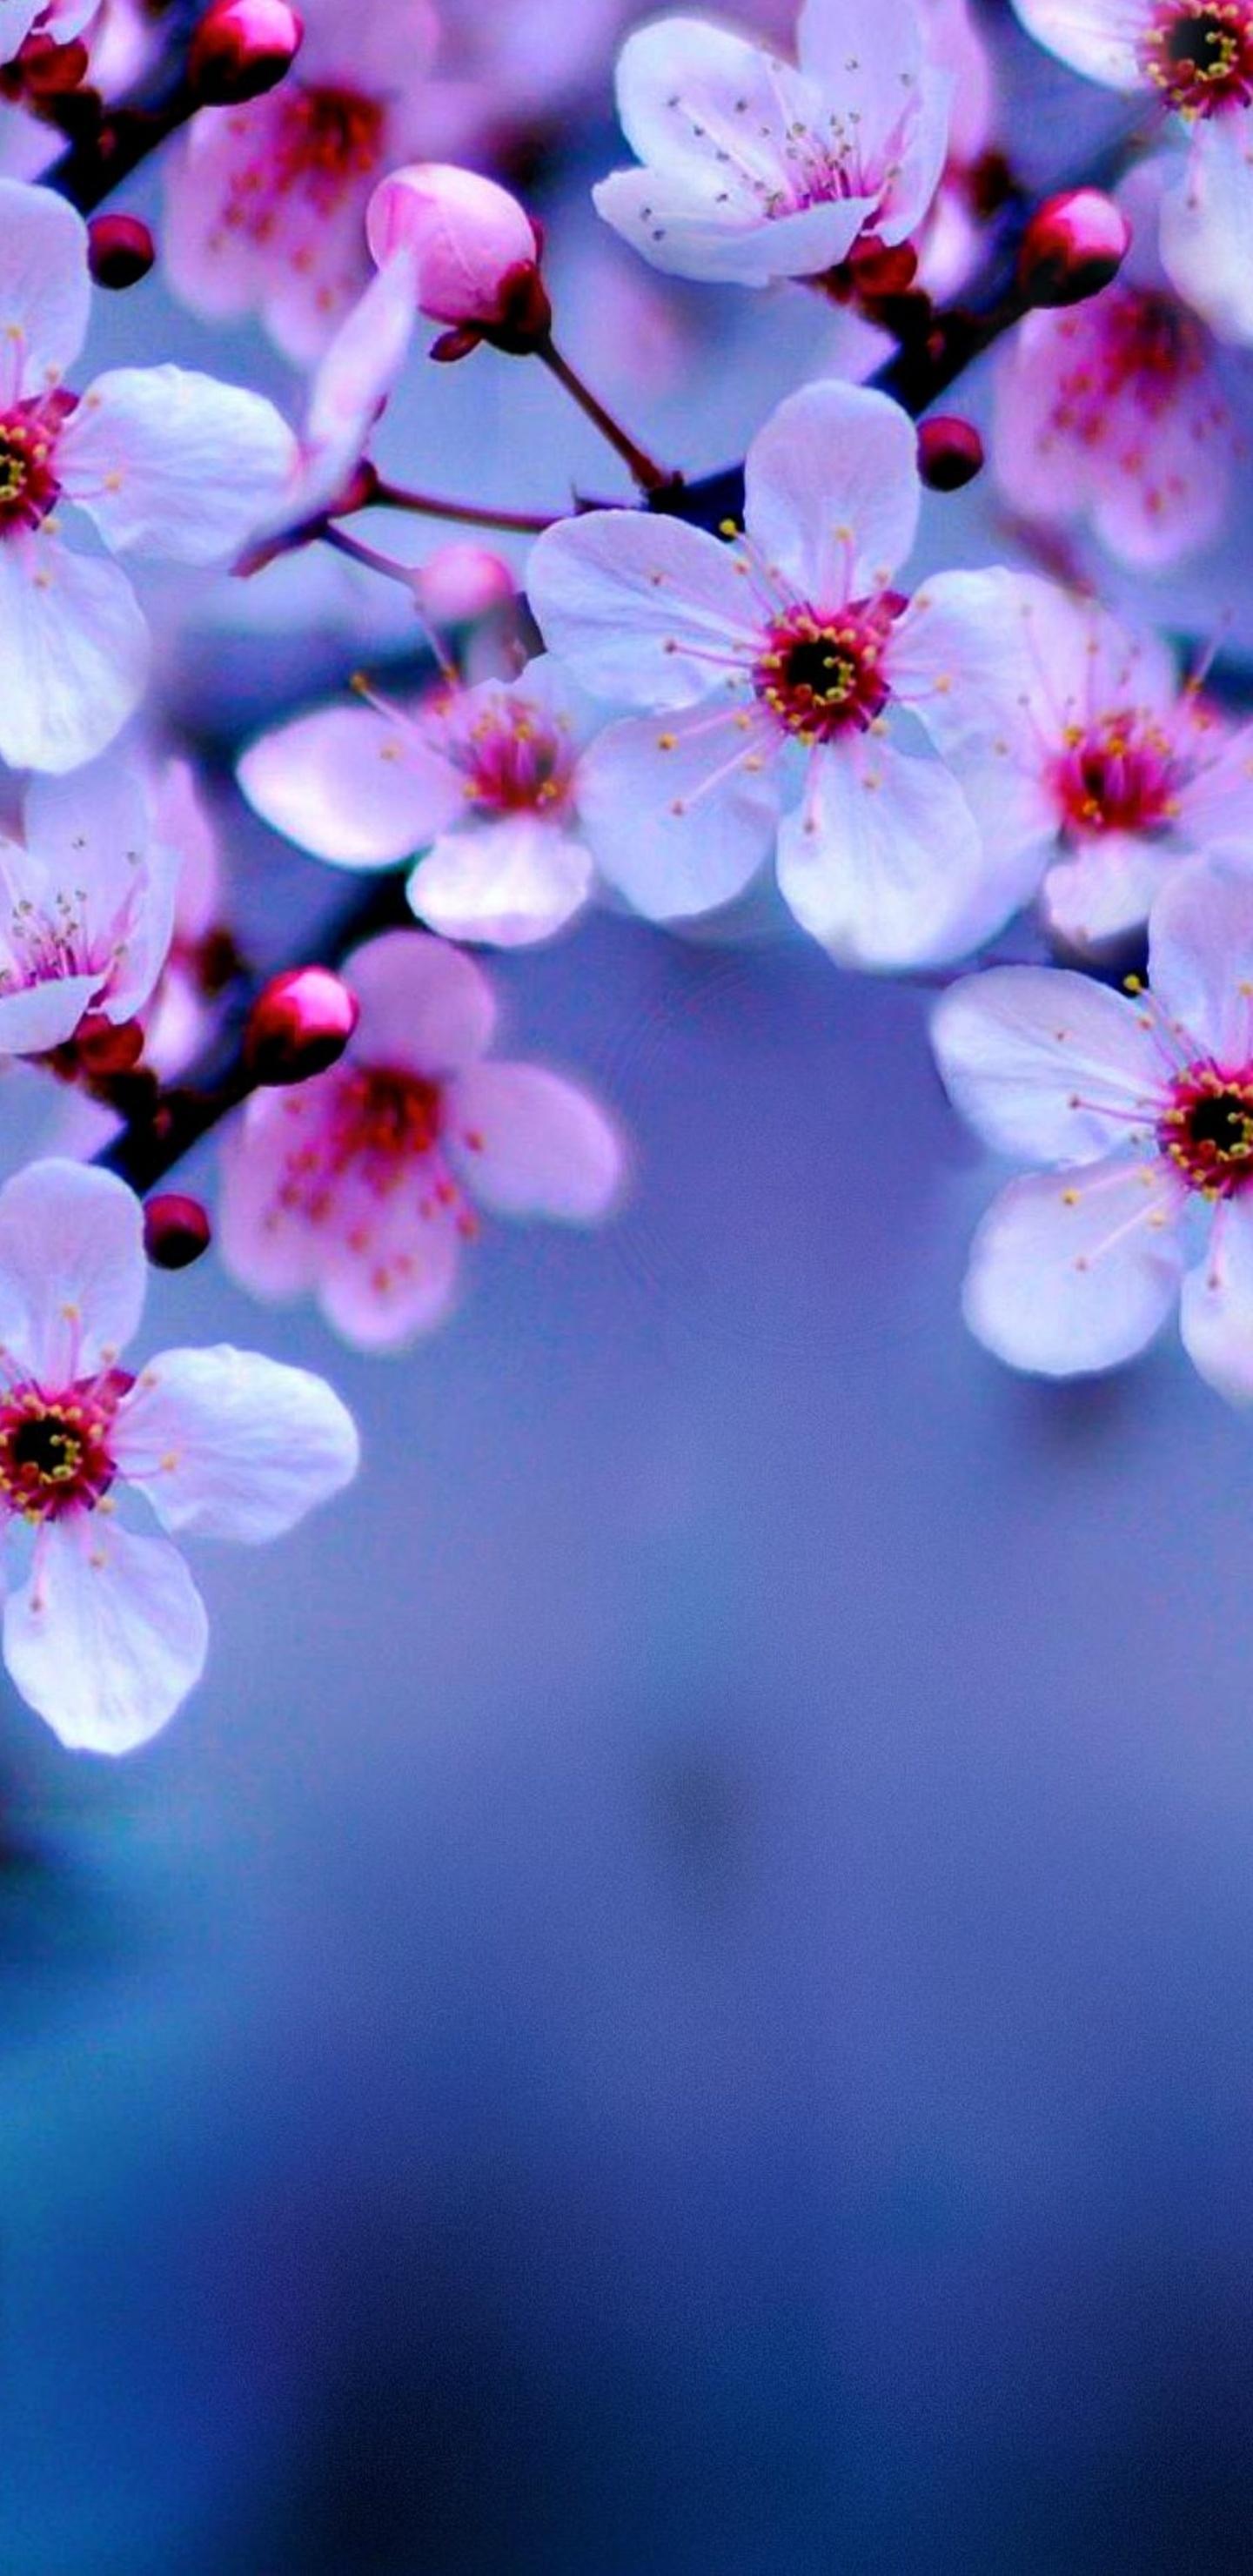 1440x2960 Cherry Blossom 4k Samsung Galaxy Note 9,8, S9,S8 ...